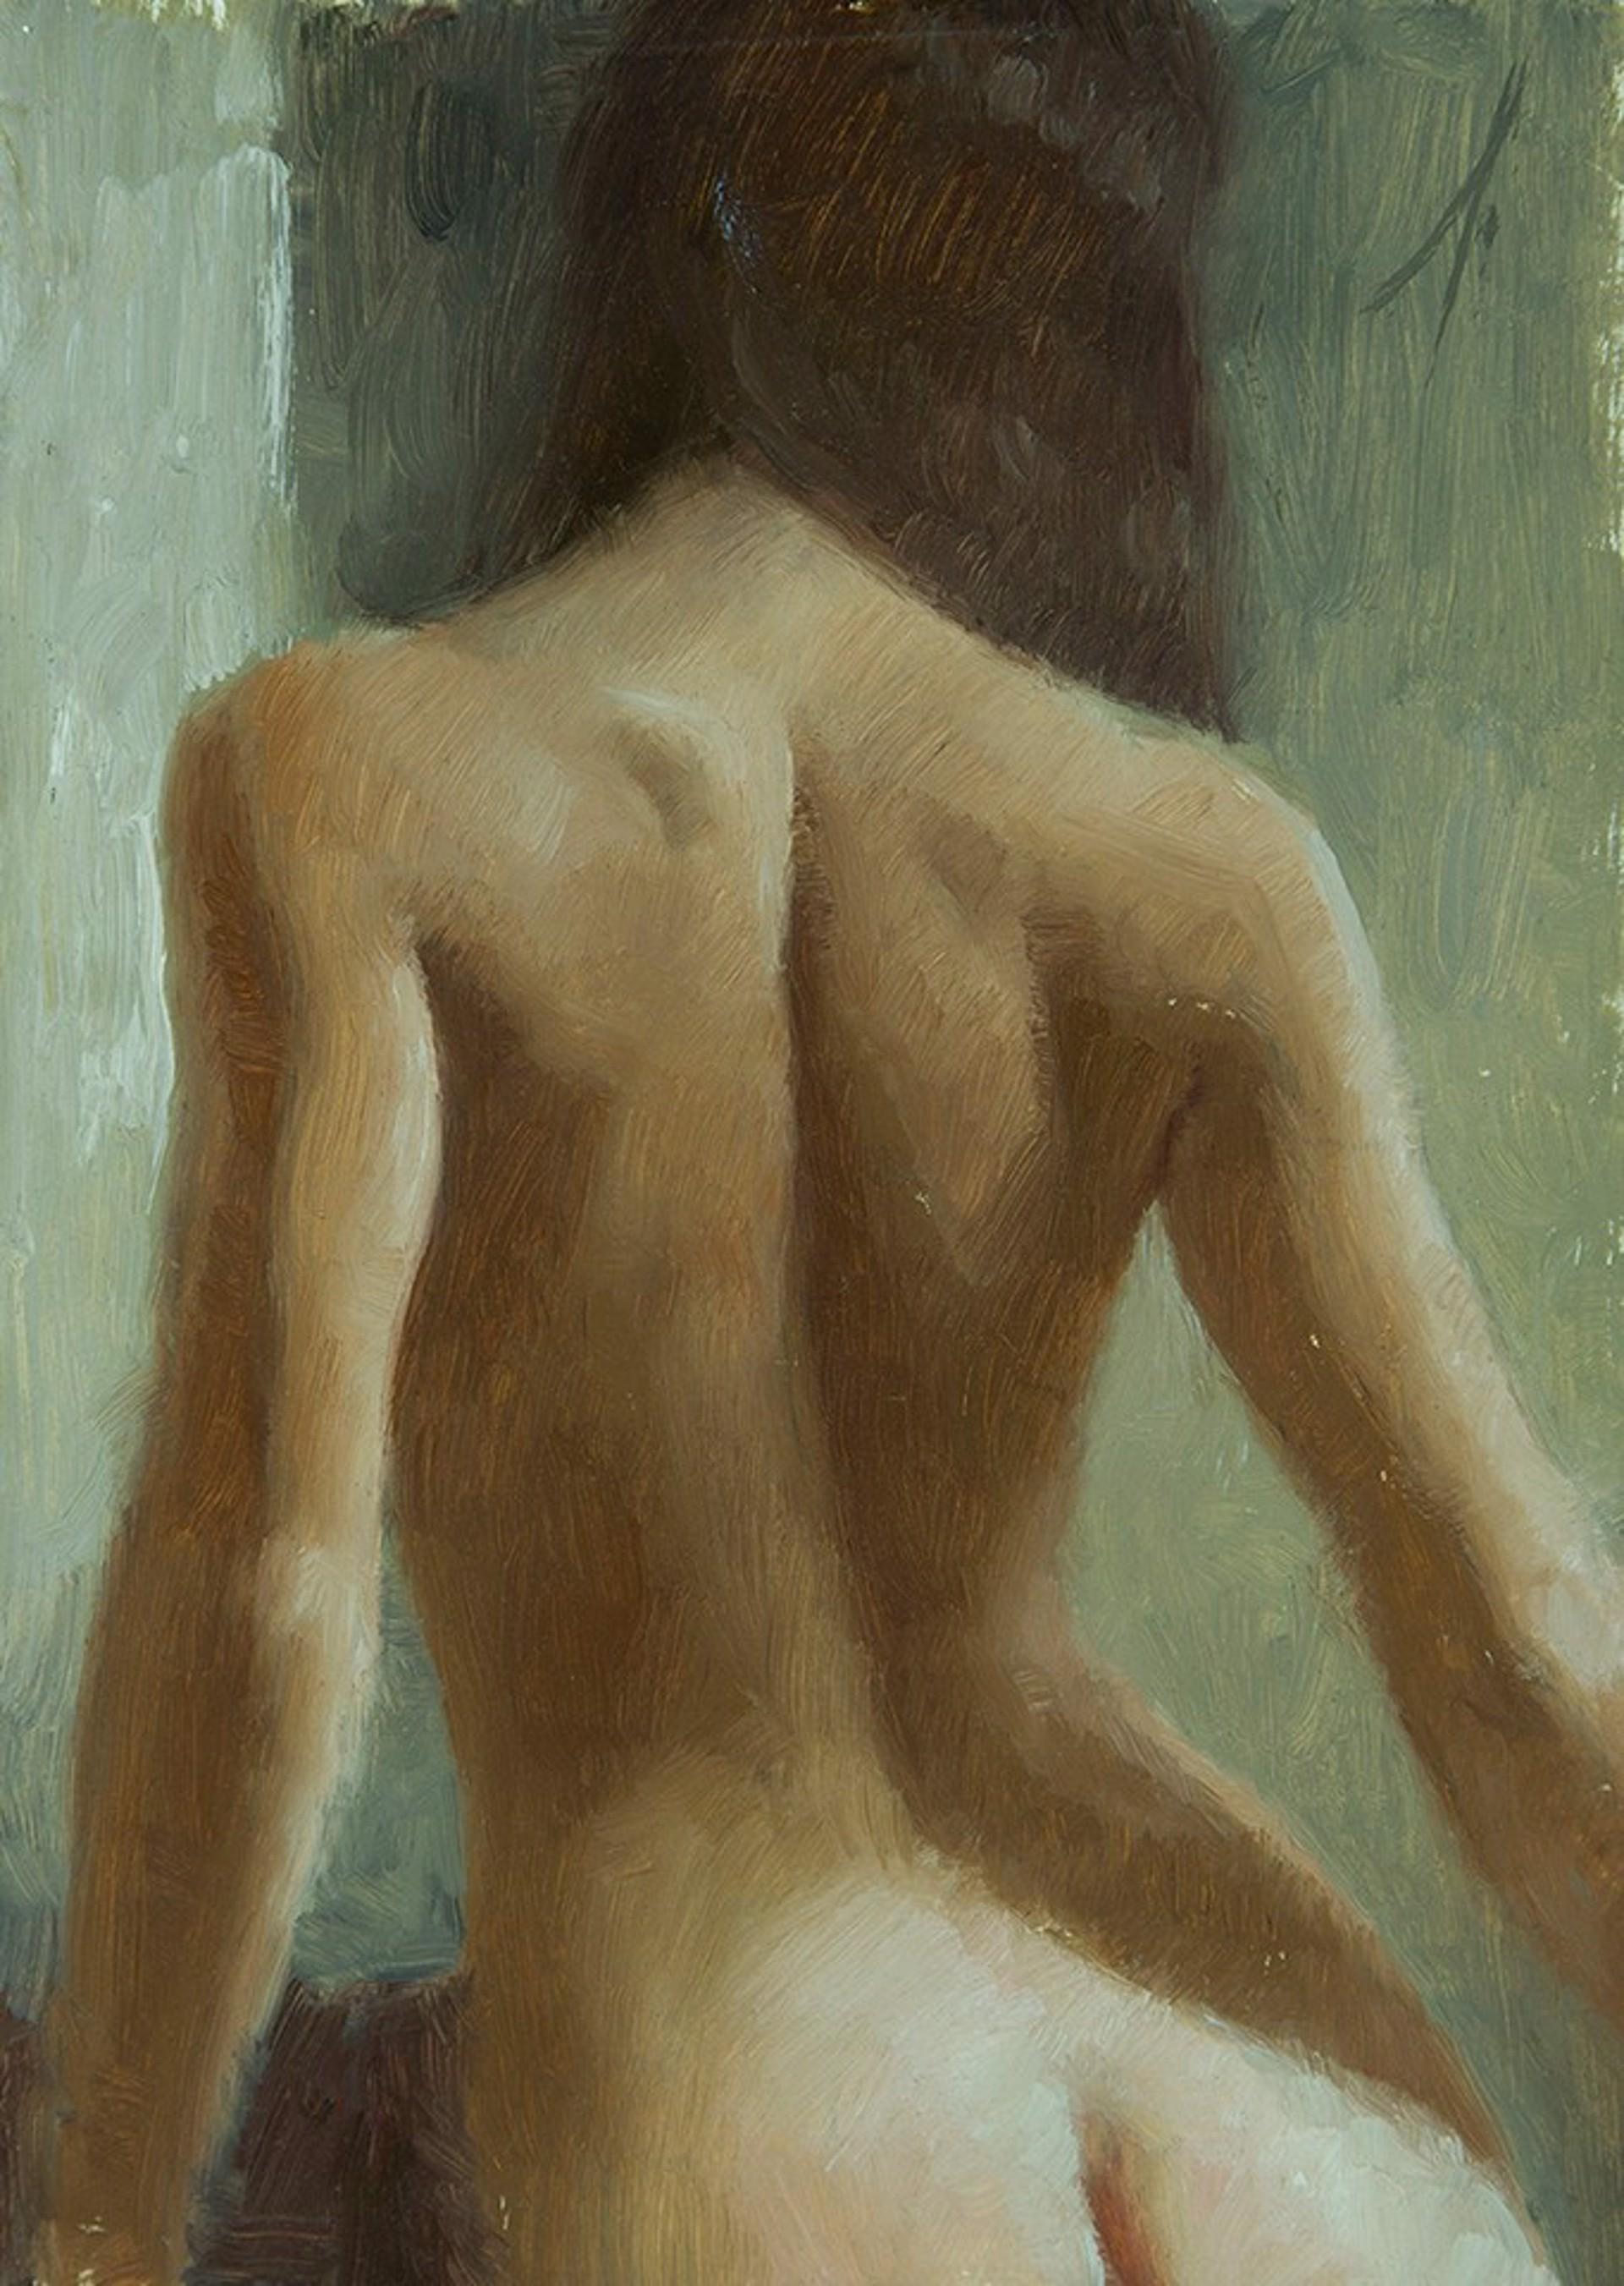 Back View 4 by Mark Bradley Schwartz